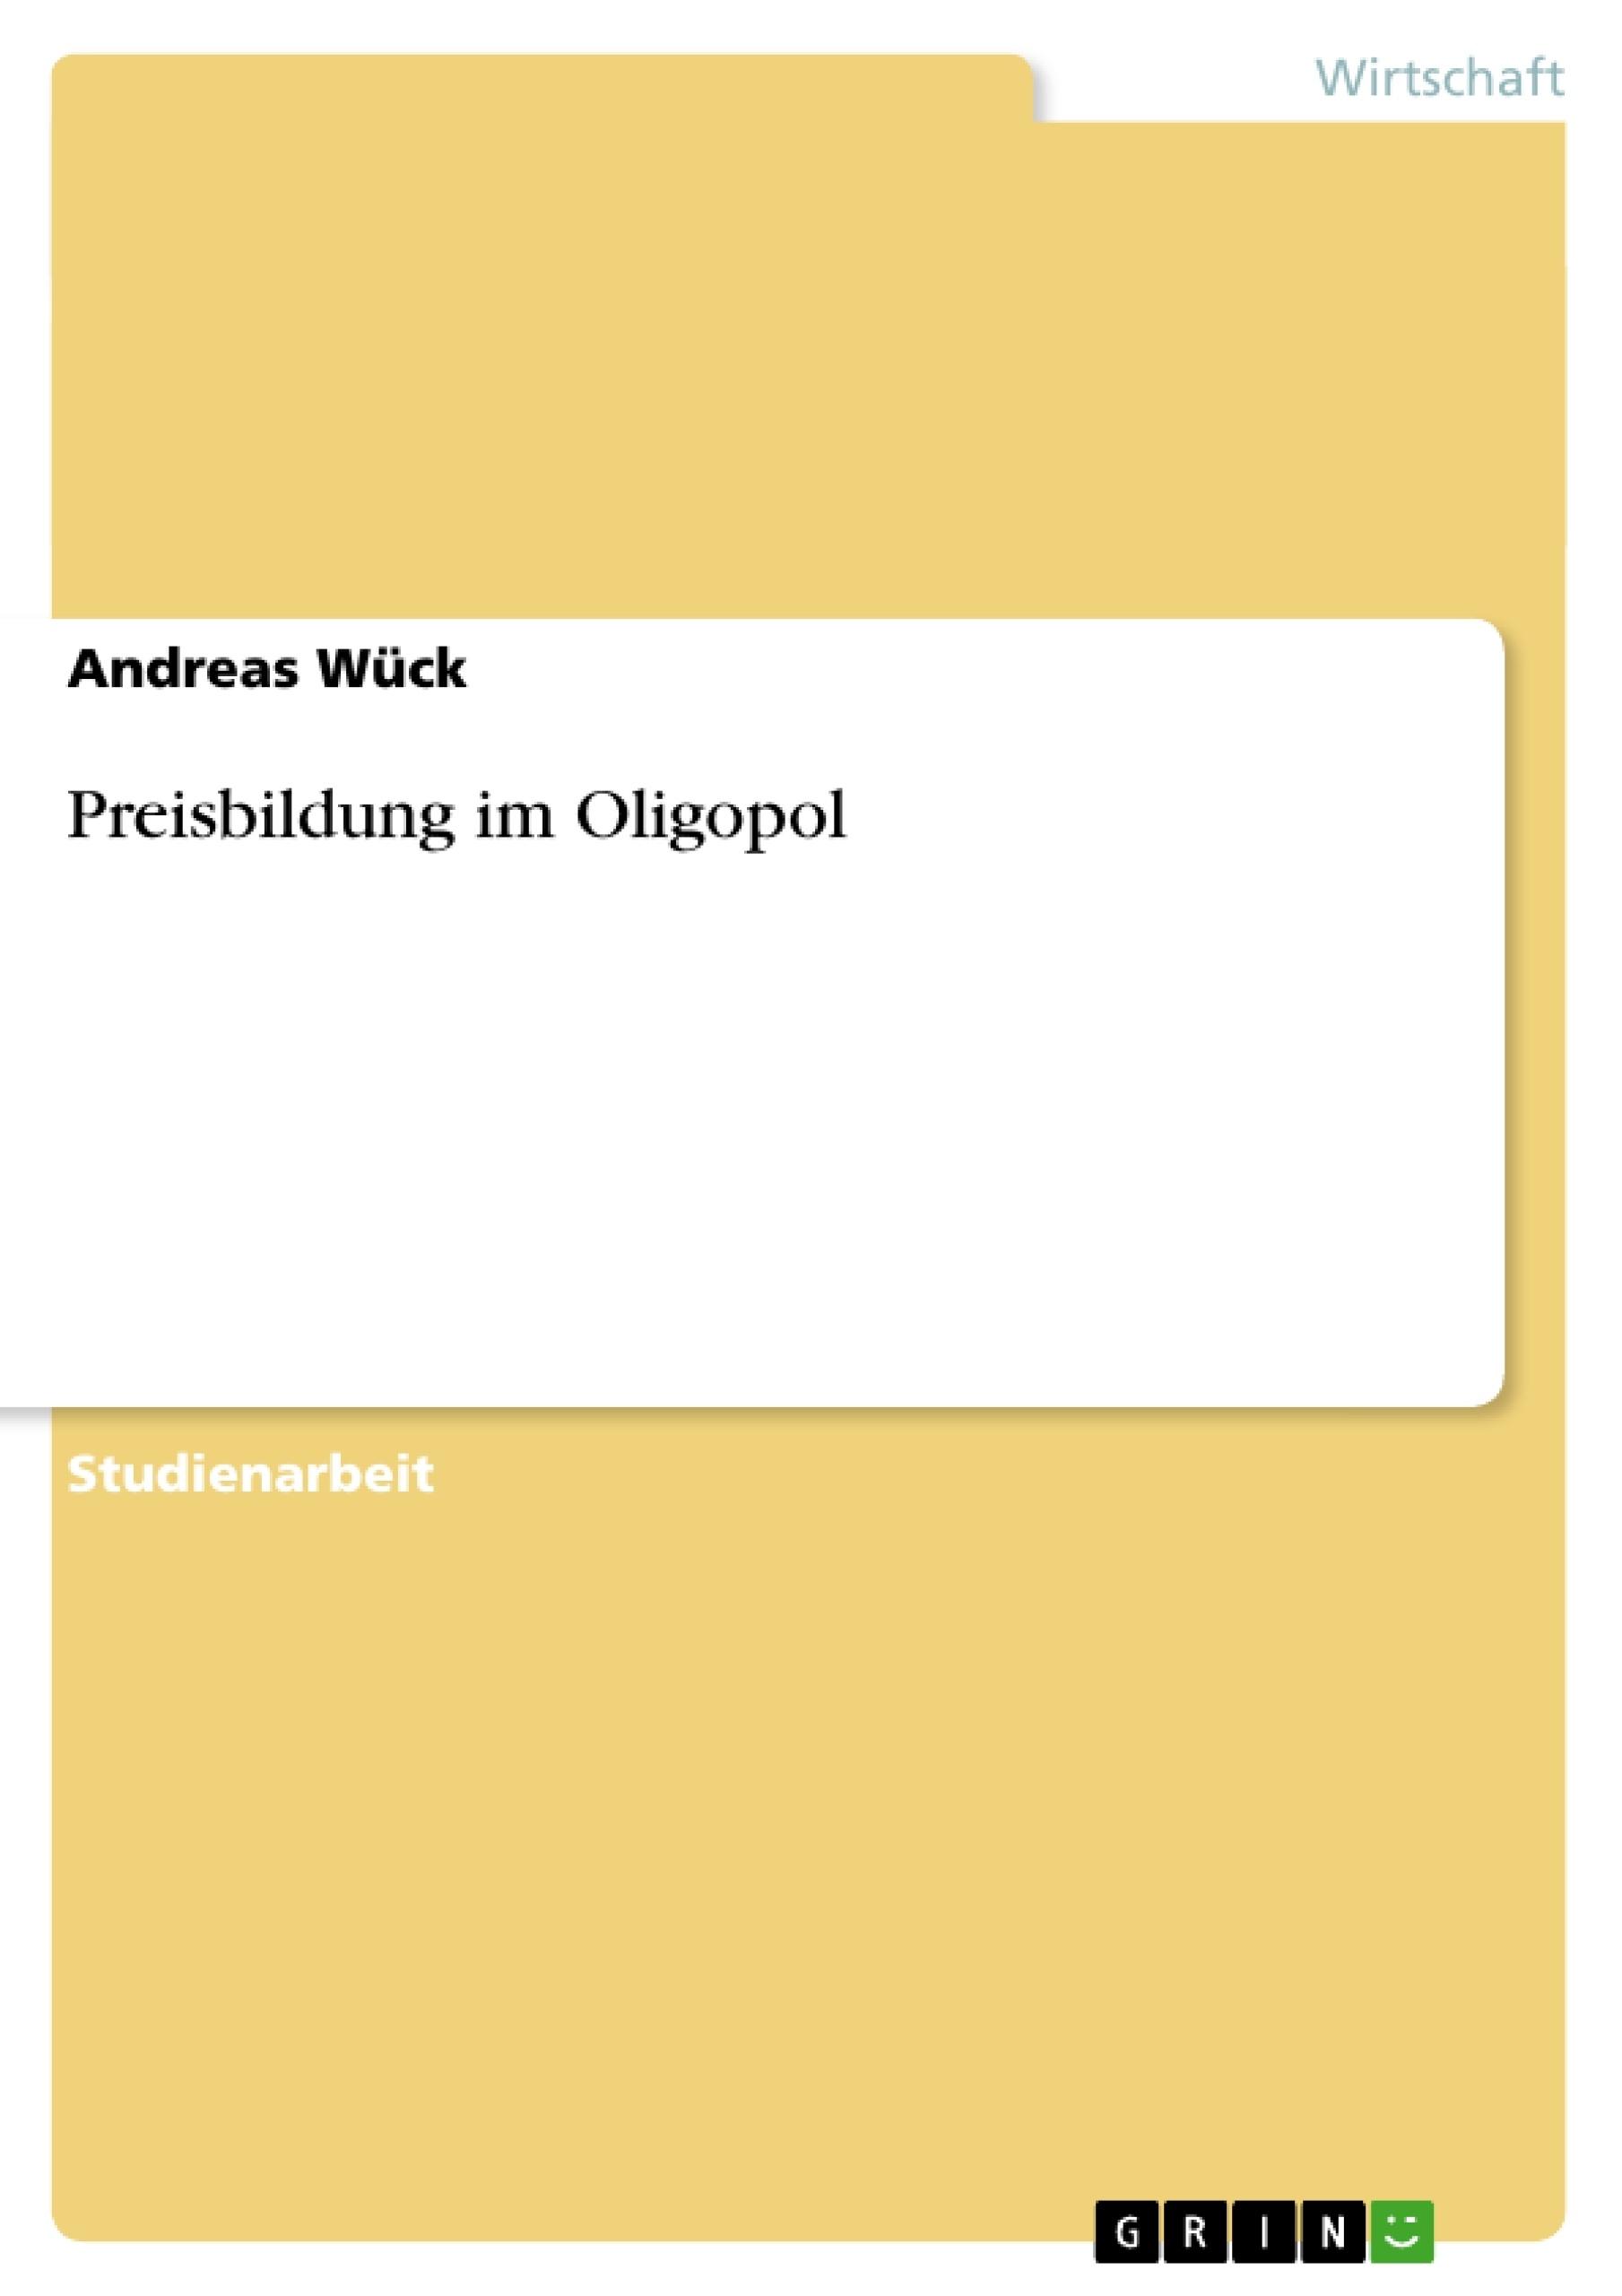 Titel: Preisbildung im Oligopol